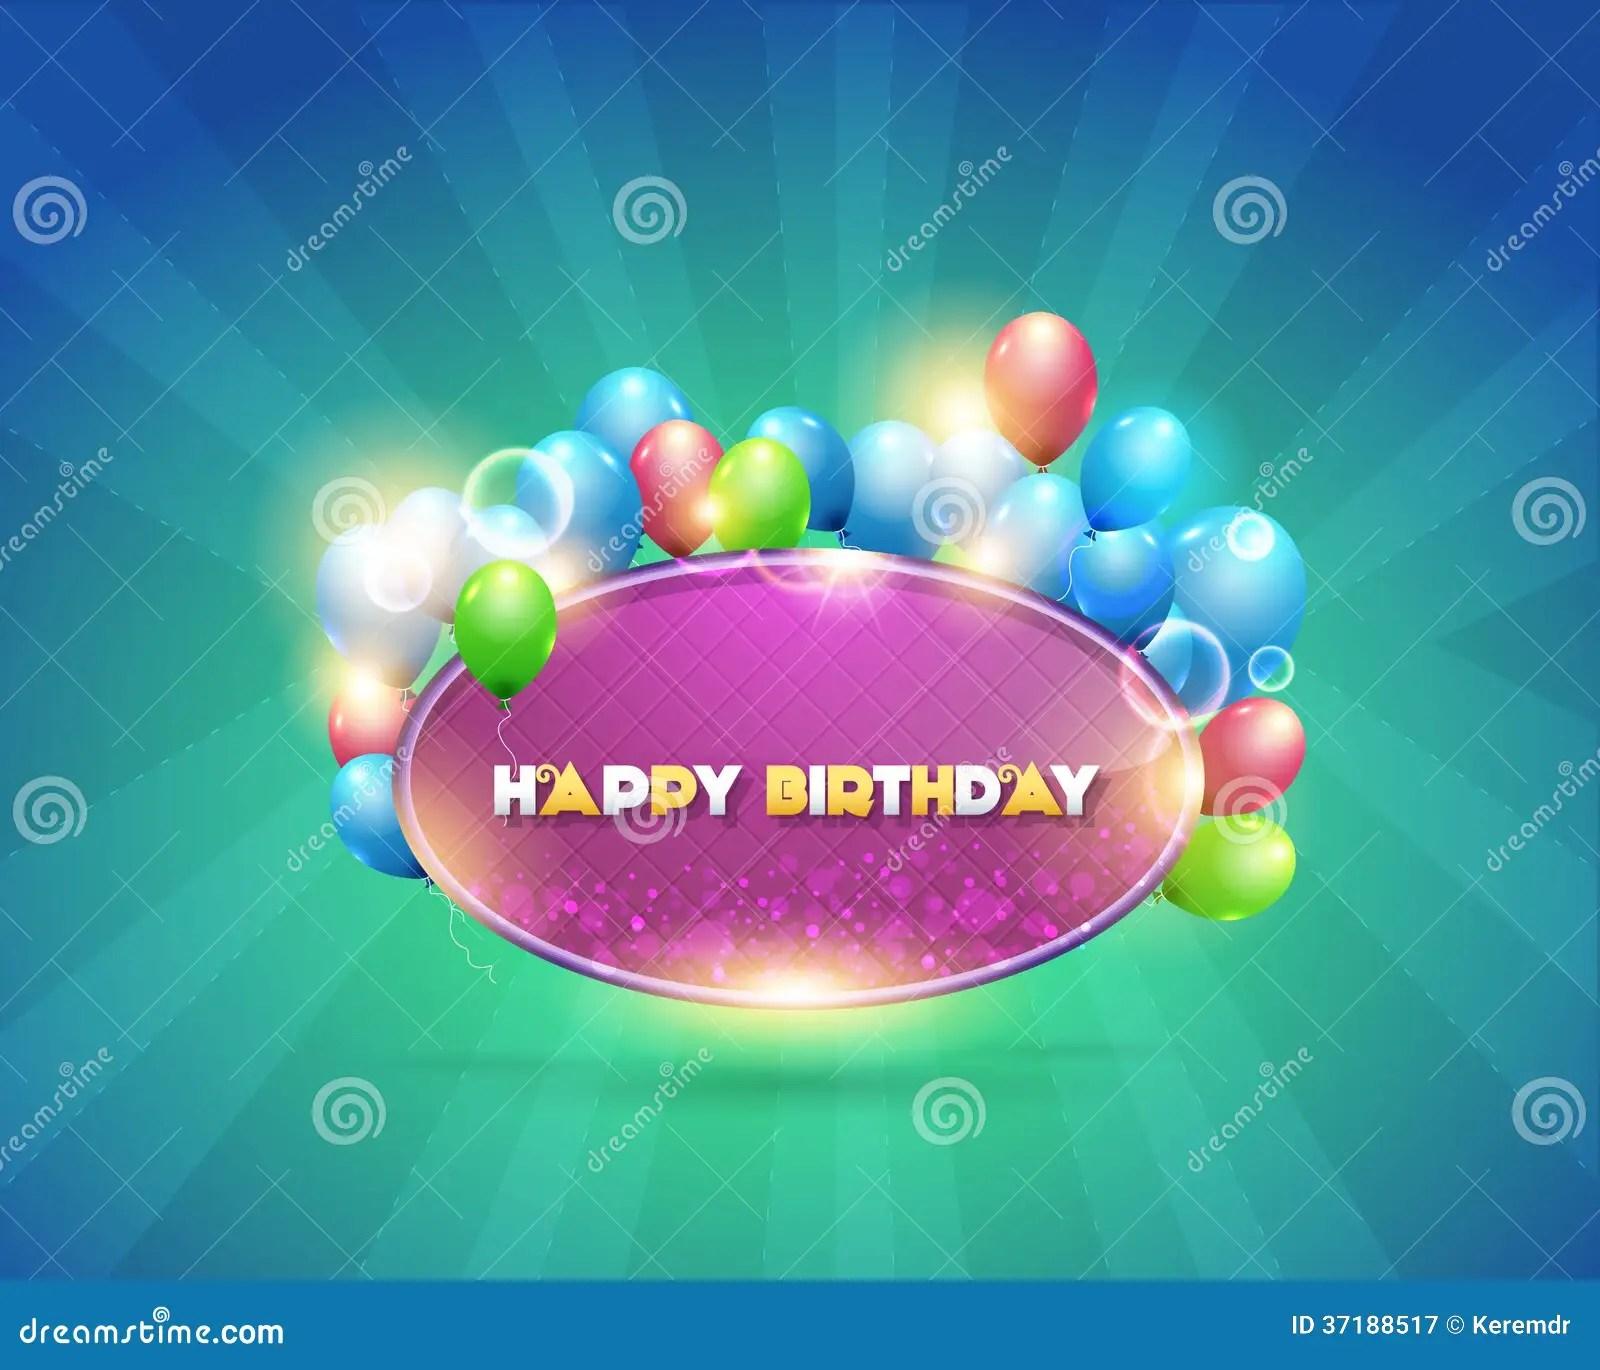 Vector Illustration Of Happy Birthday Design Backg Royalty